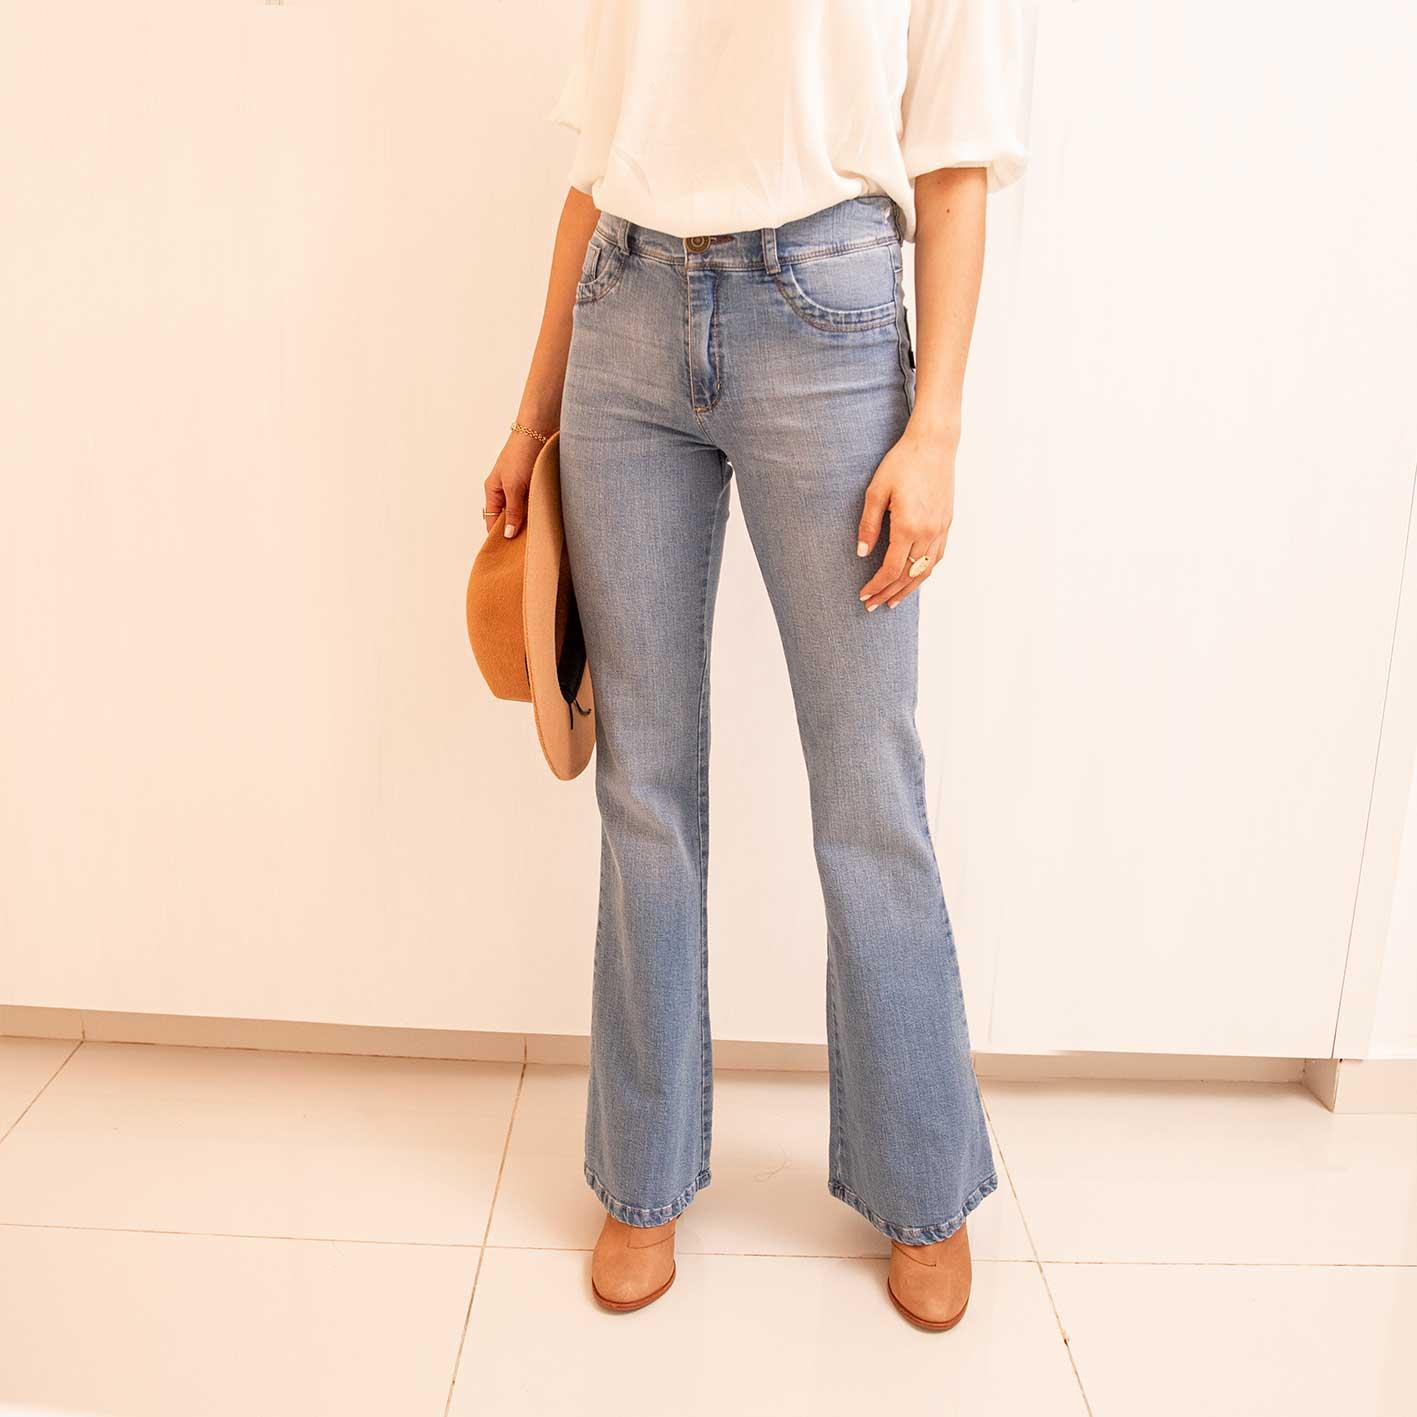 Pantalón Jeans Oxford Cod. 1210114